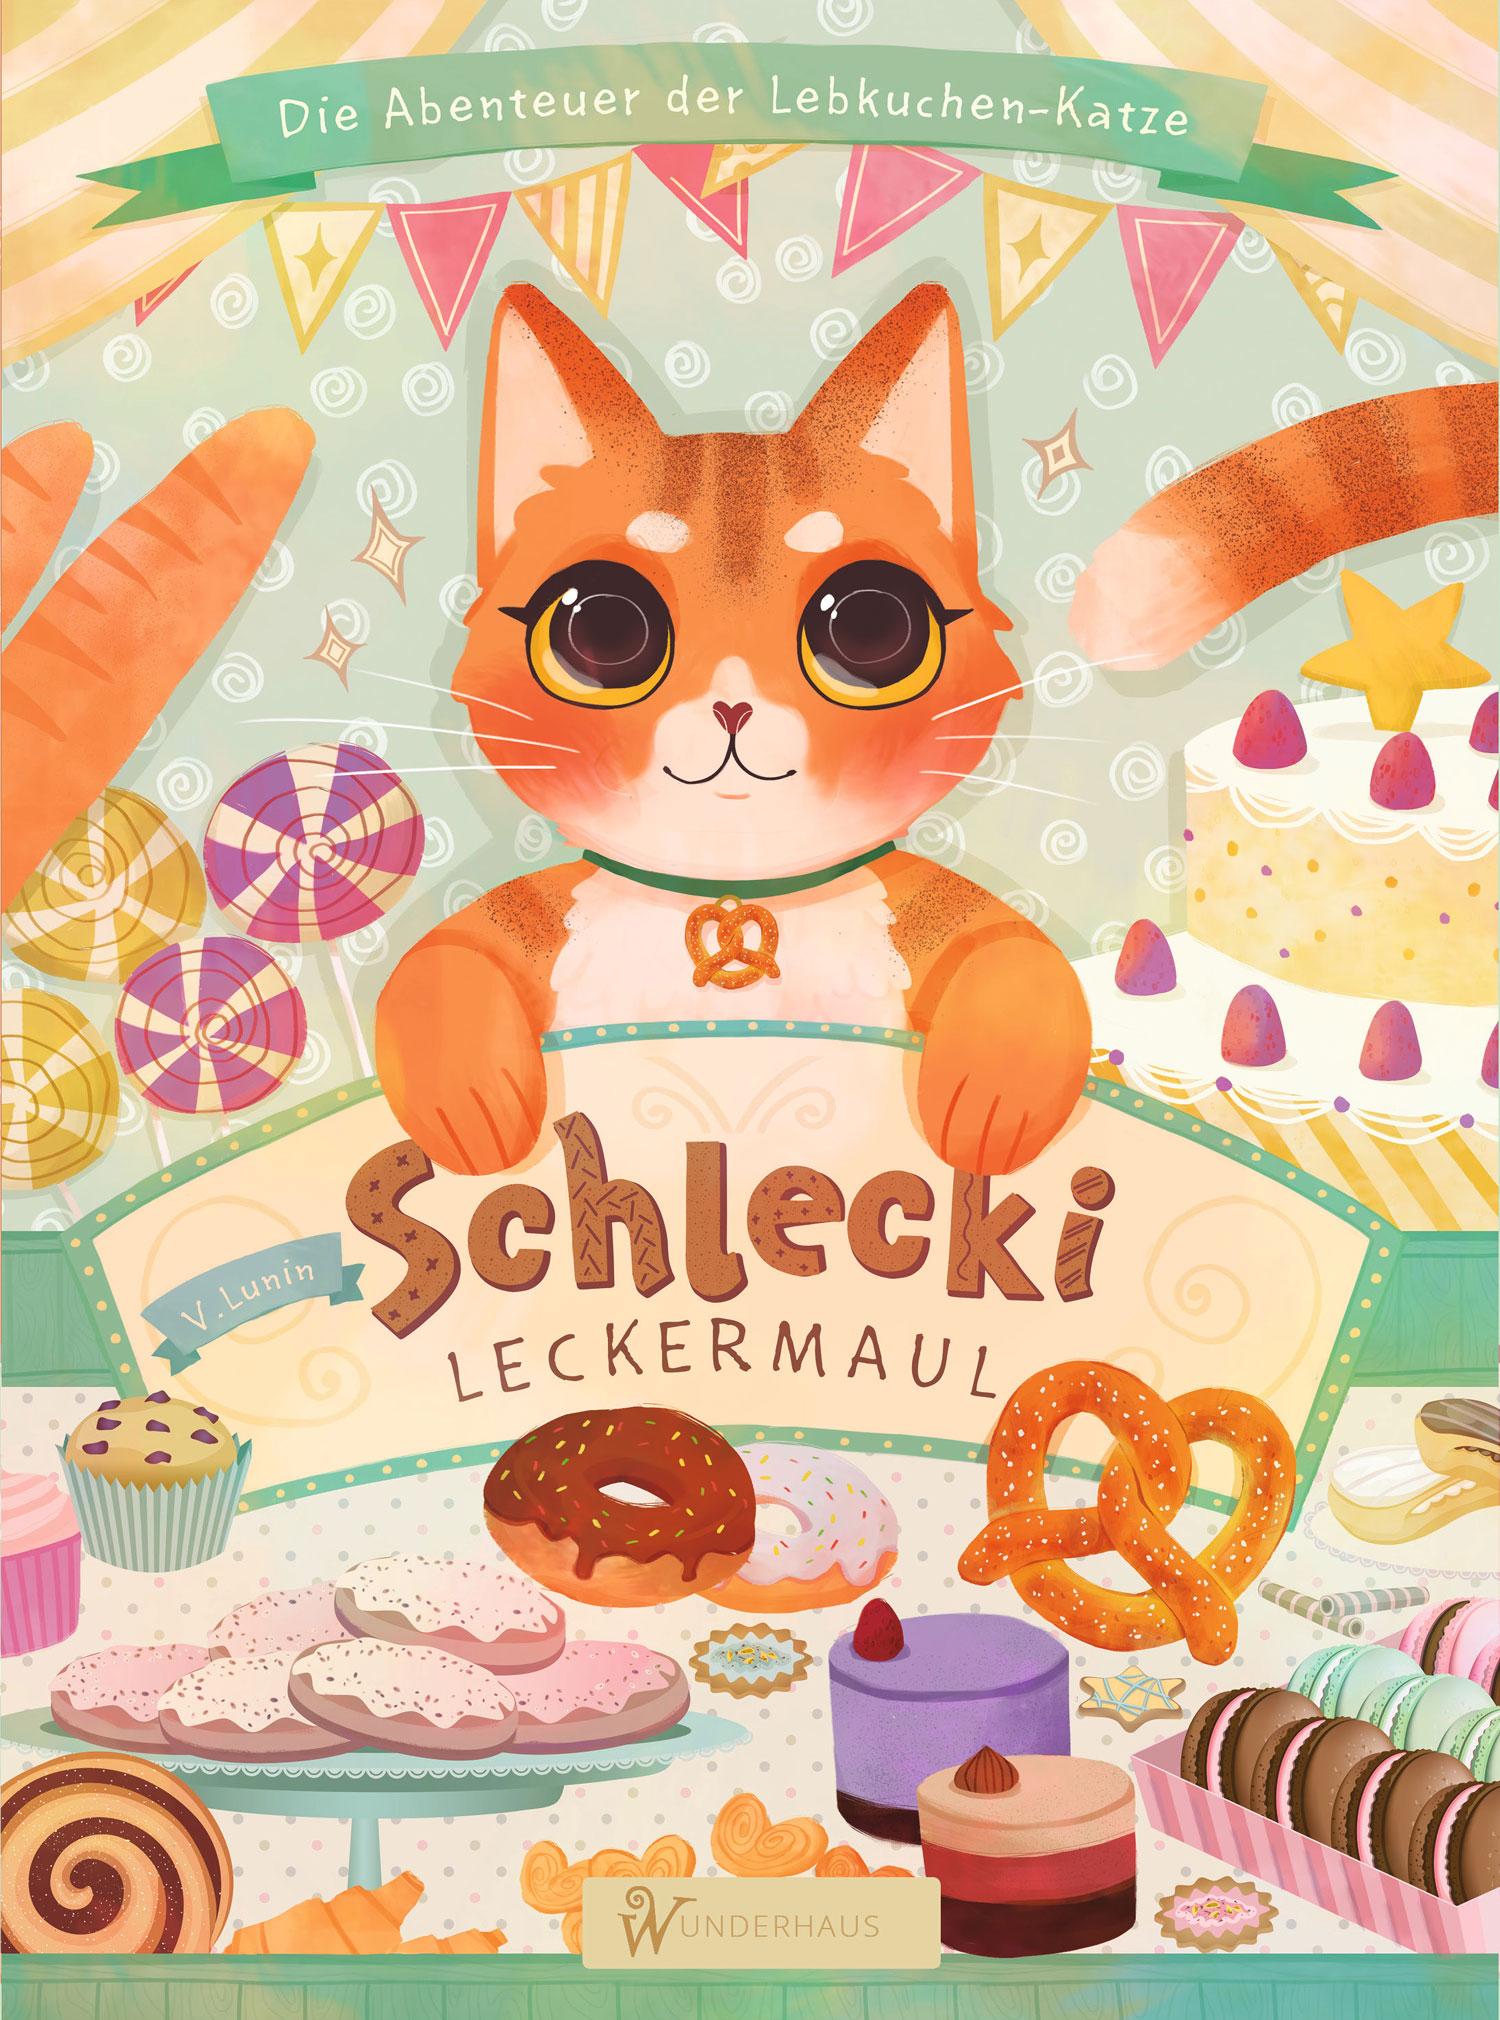 Schlecki Leckermaul